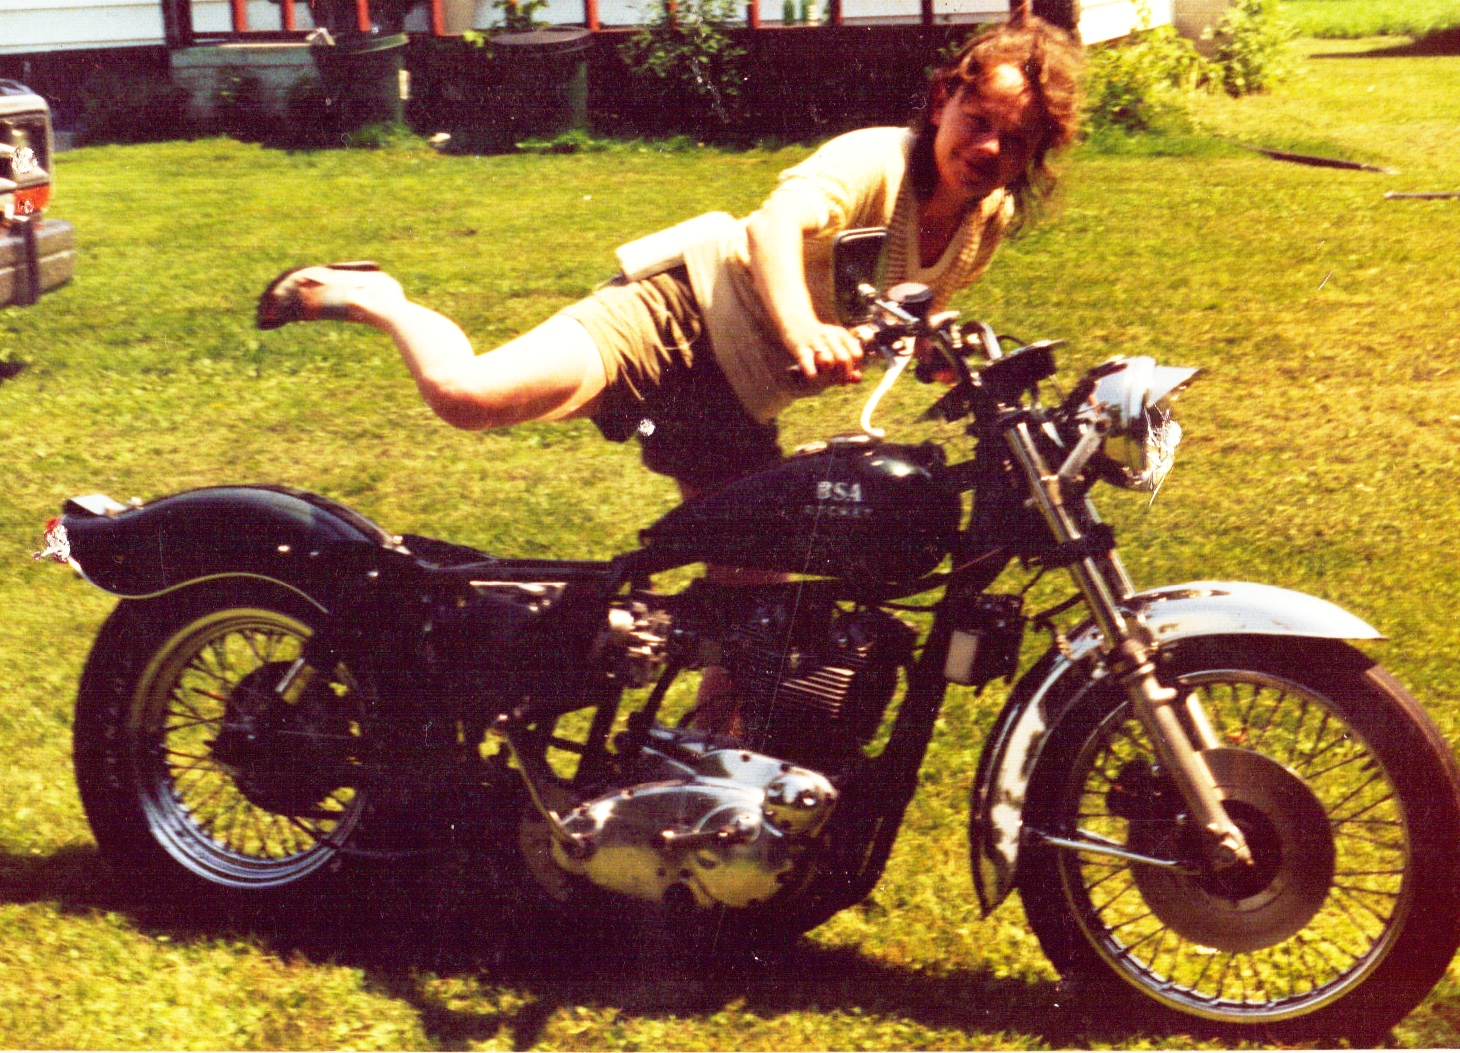 1969 Rocket 3 motorcycle